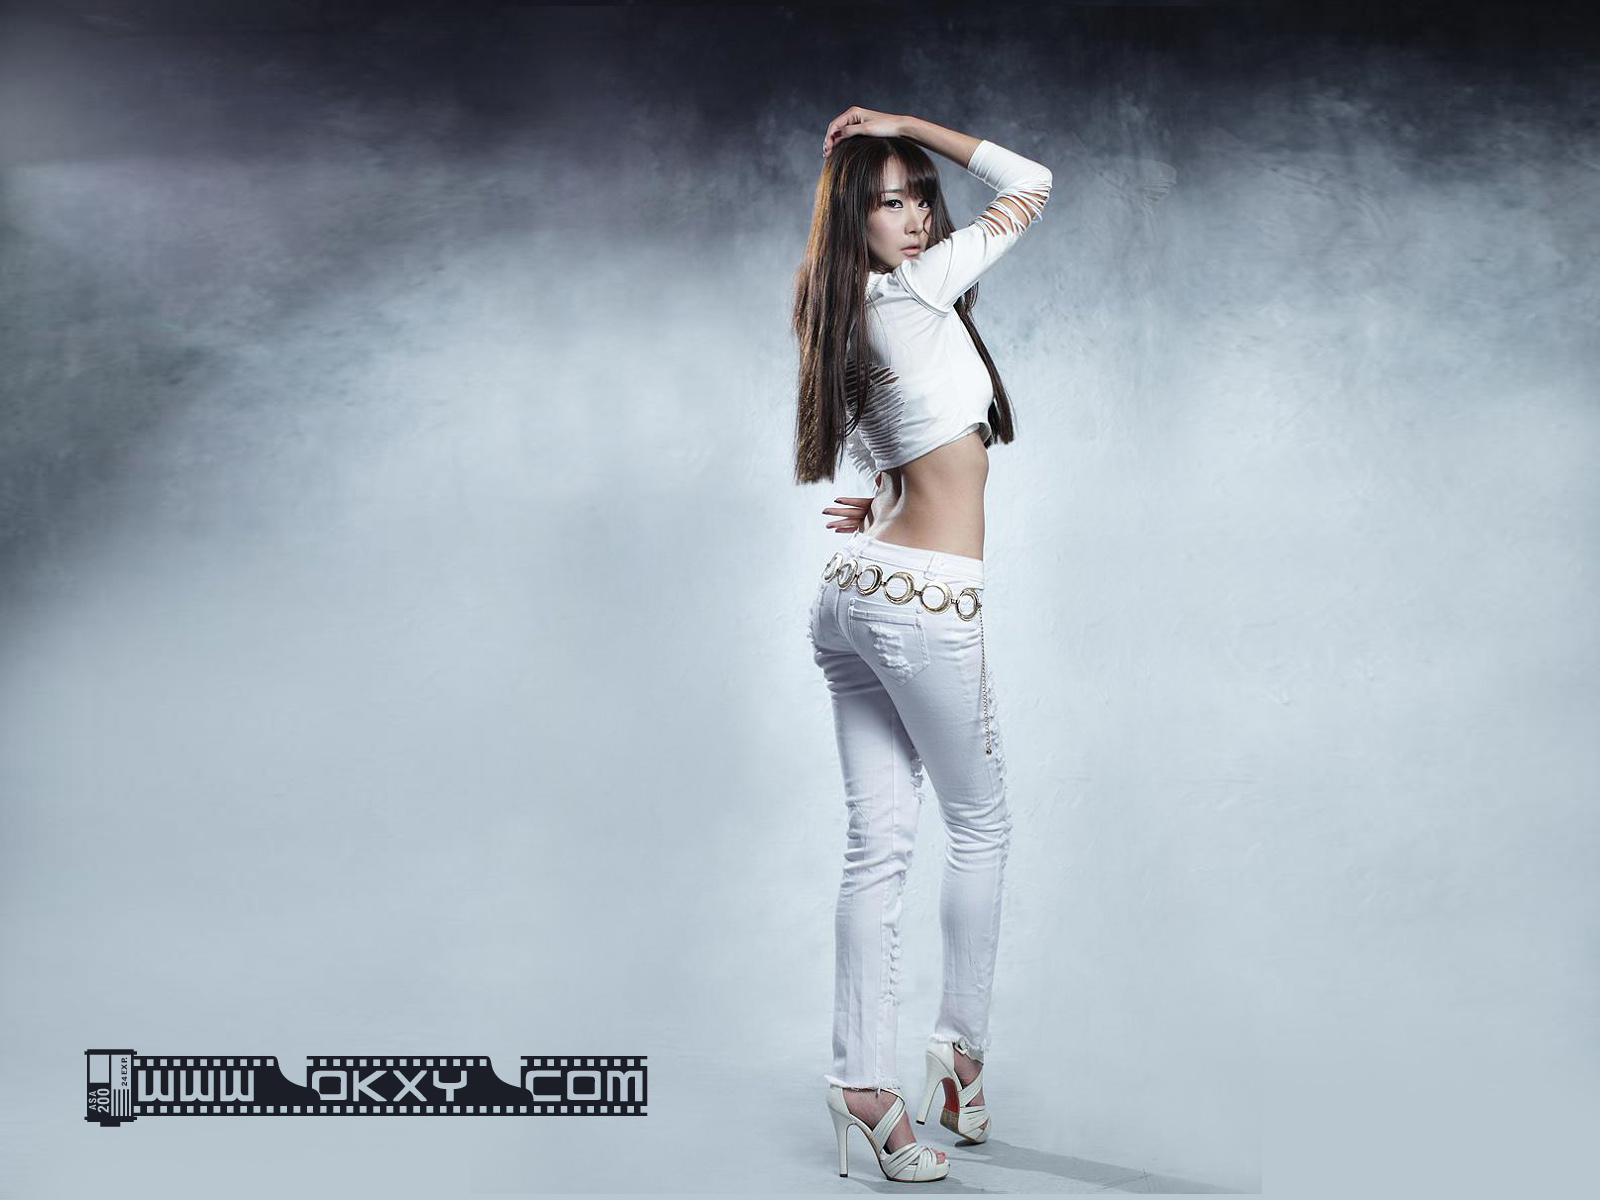 韩国美女壁纸韩国美女高清壁纸美女电影韩国美女桌